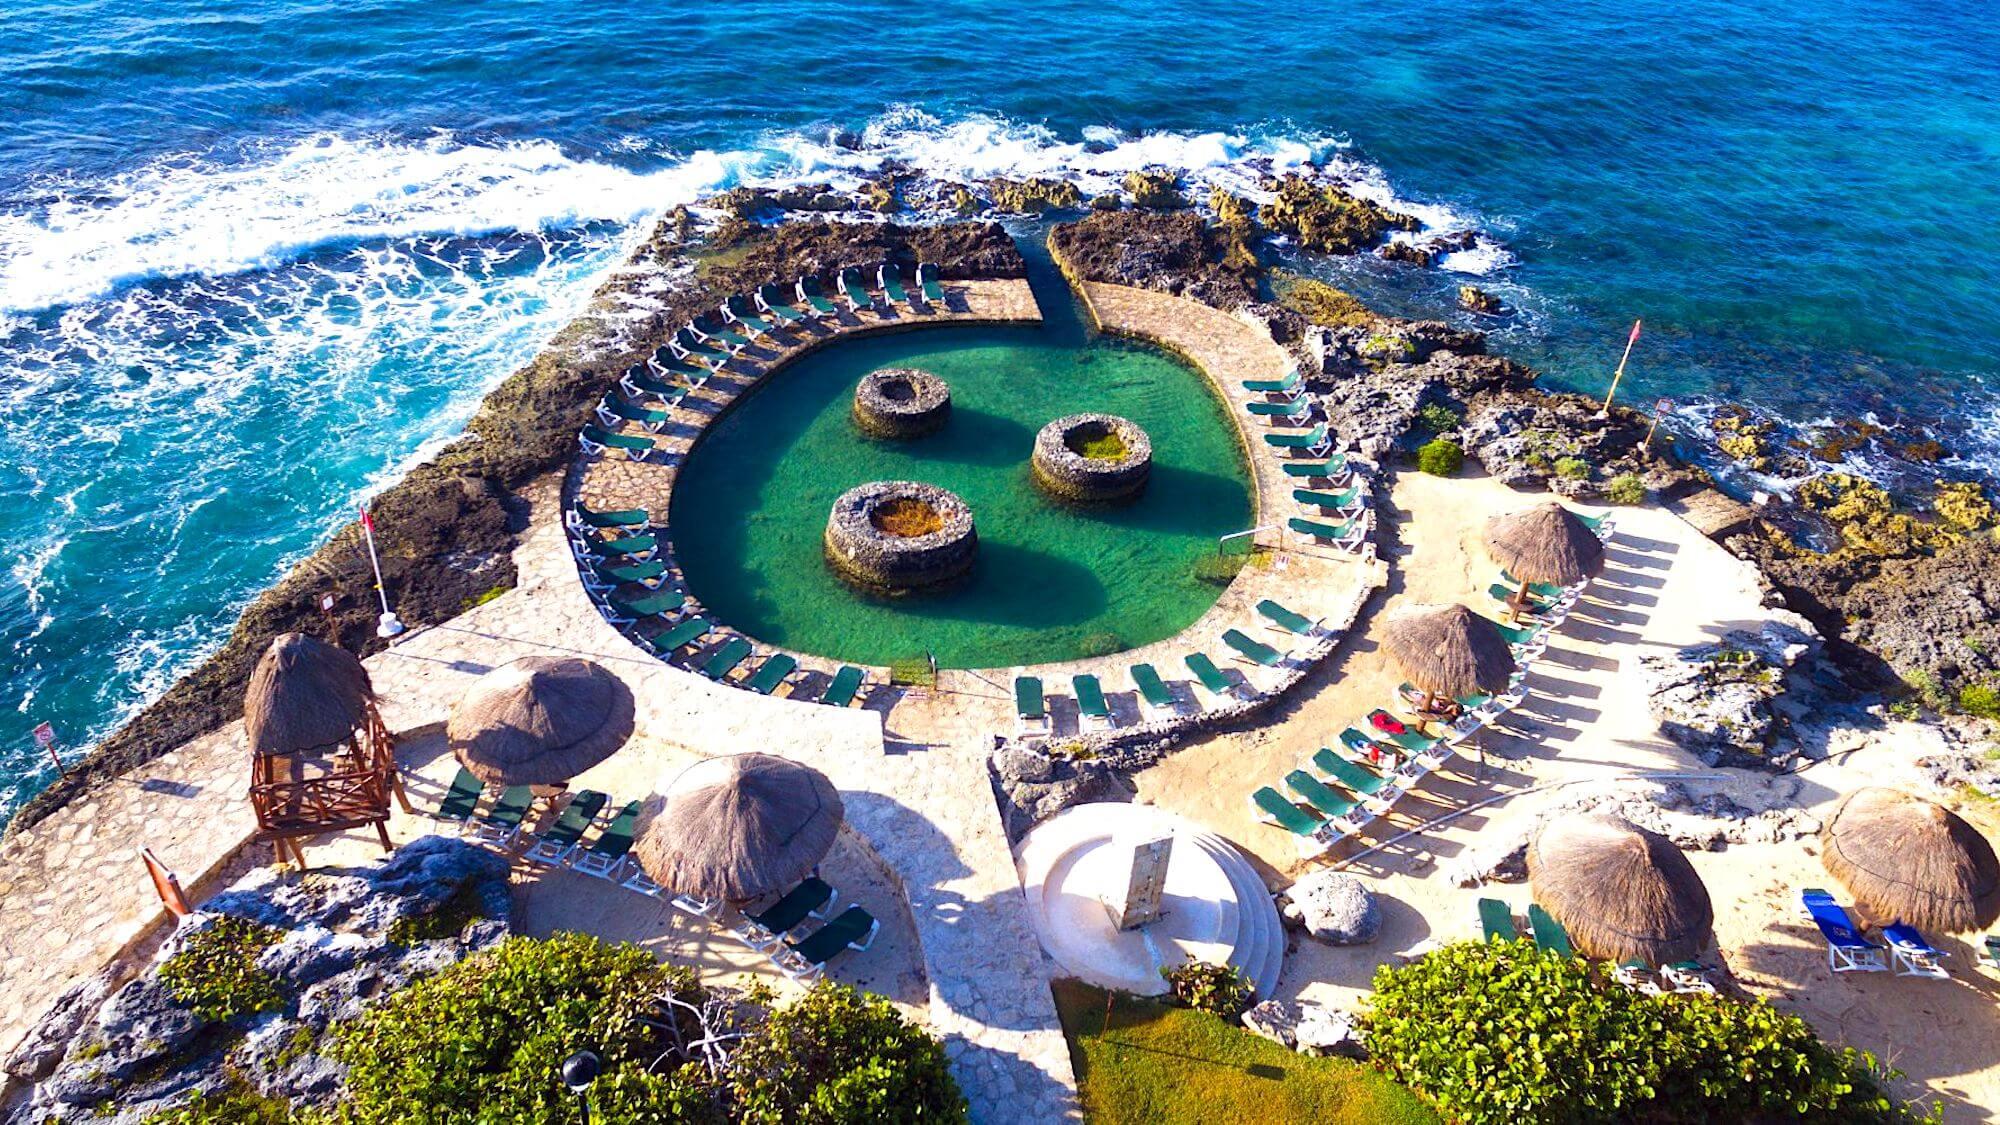 Occidental at Xcaret Destination Riviera Maya Coast